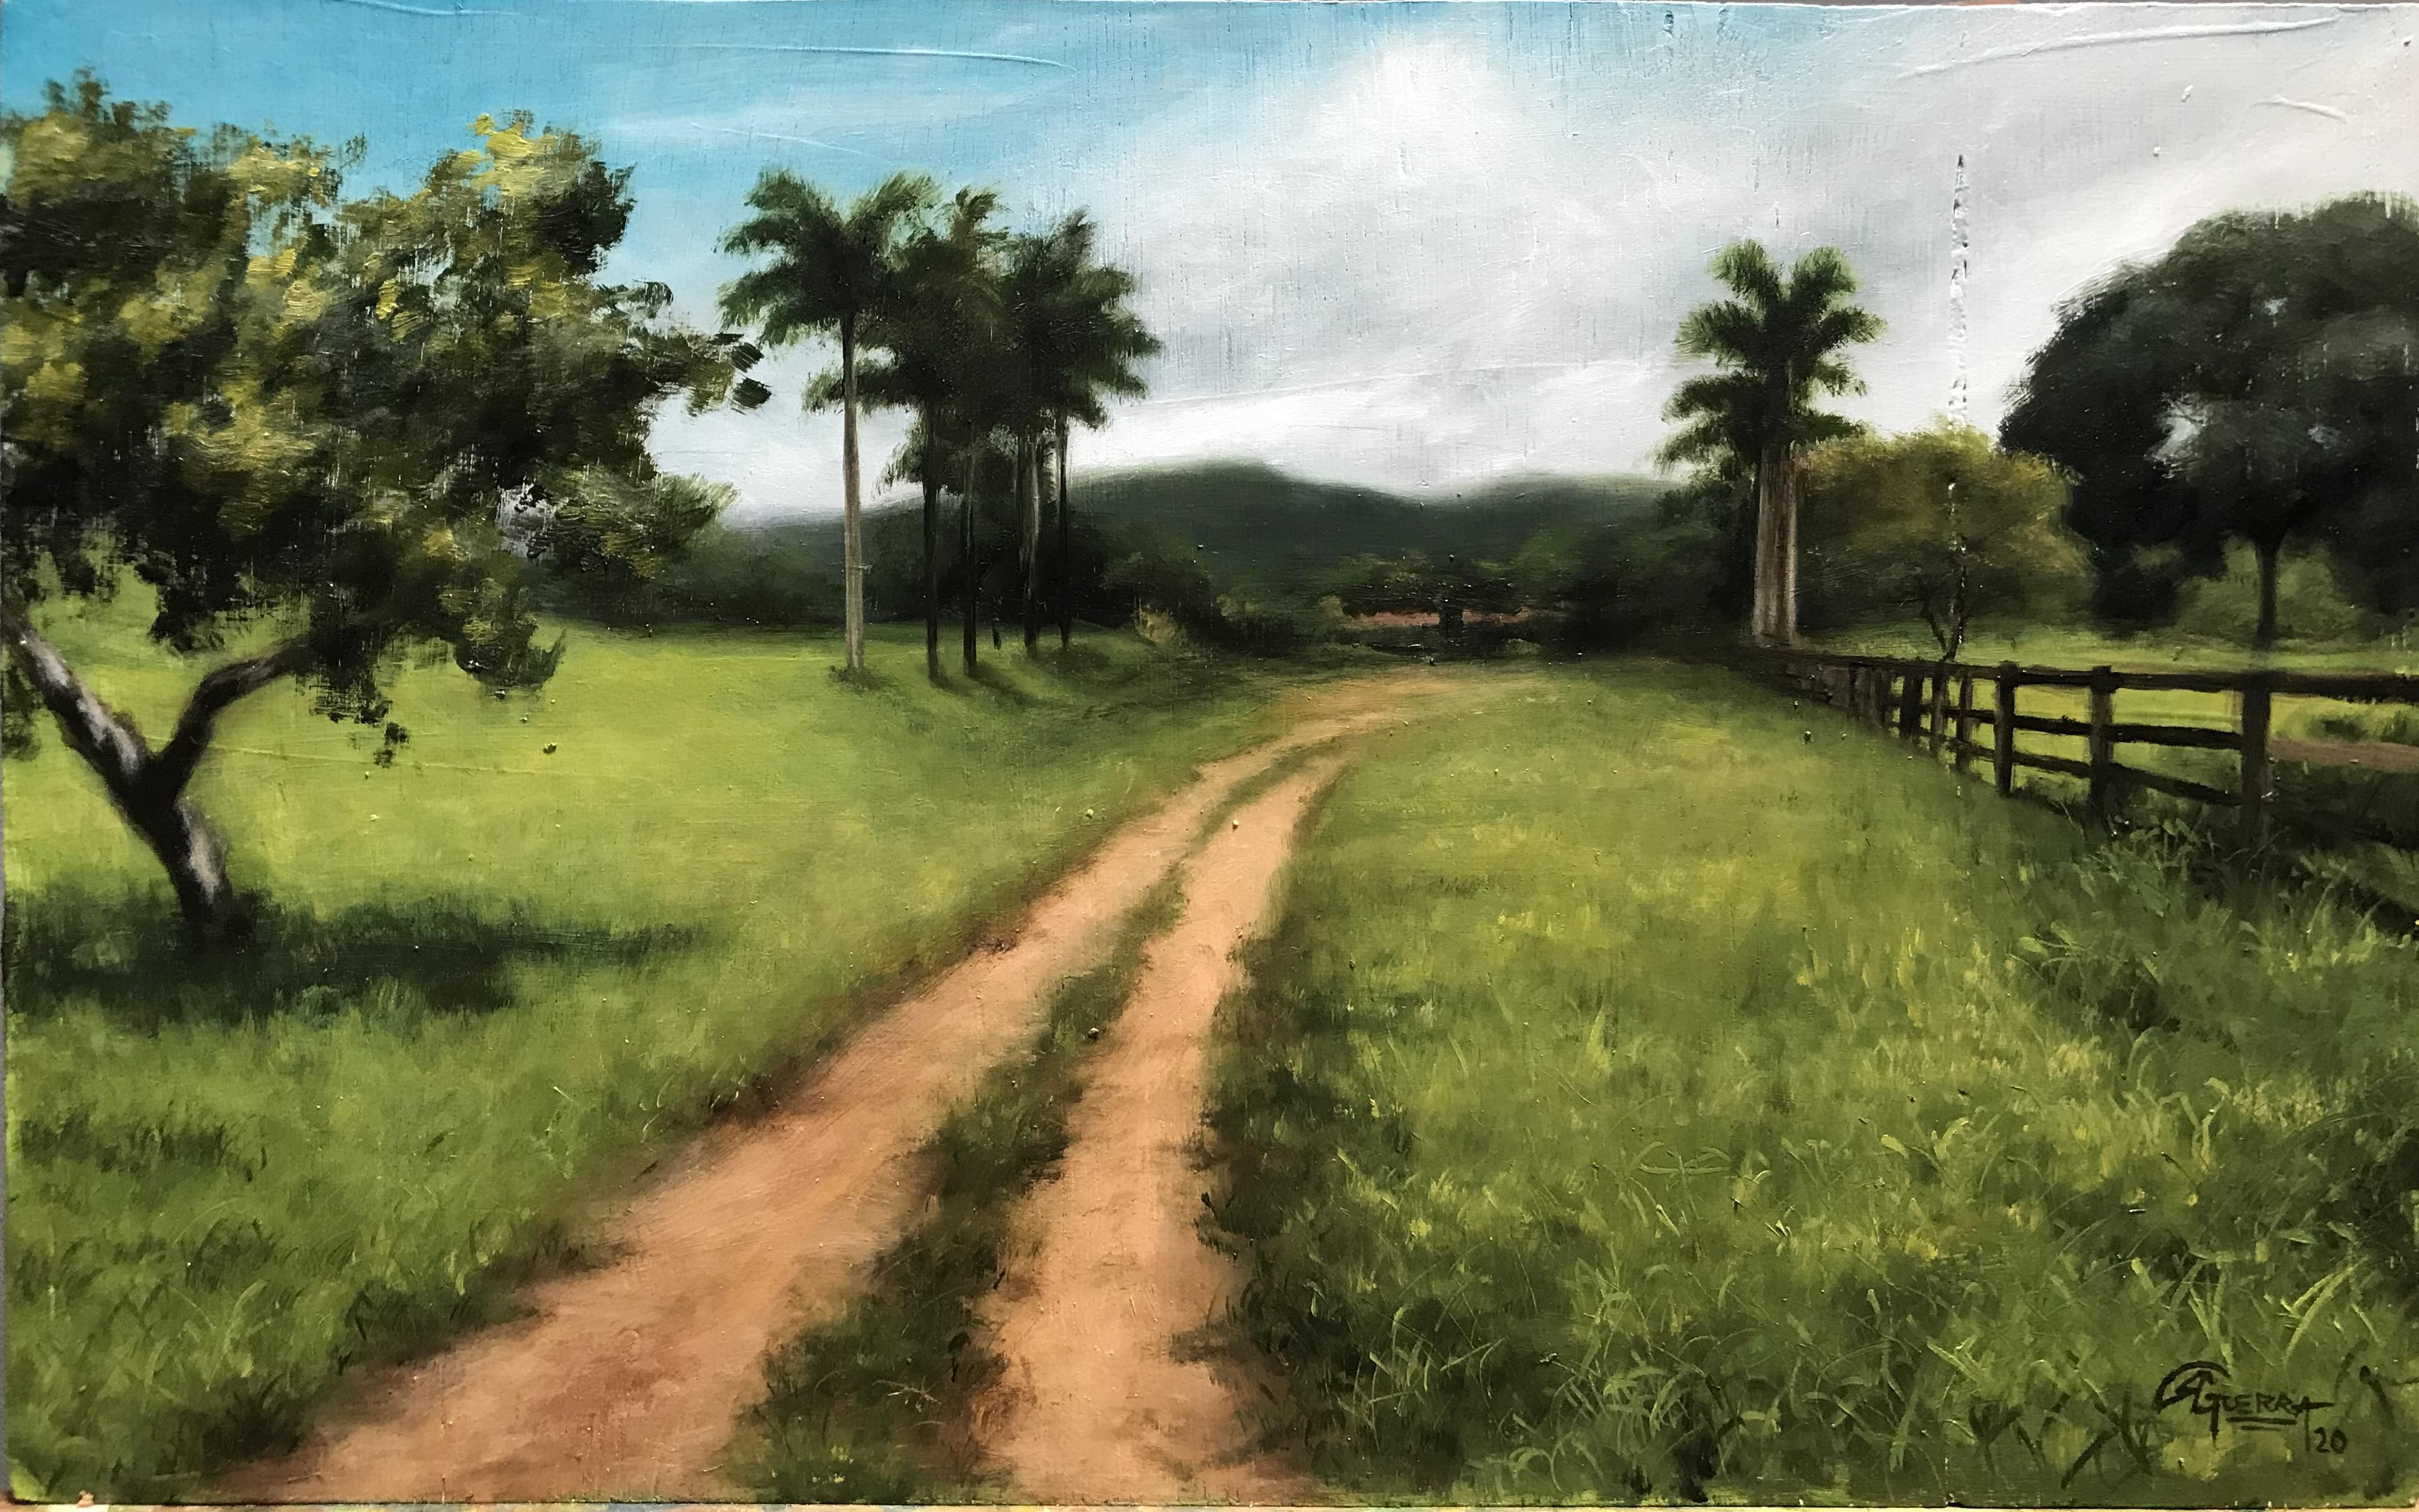 Paisagem Brasileira Rafael Guerra pintura